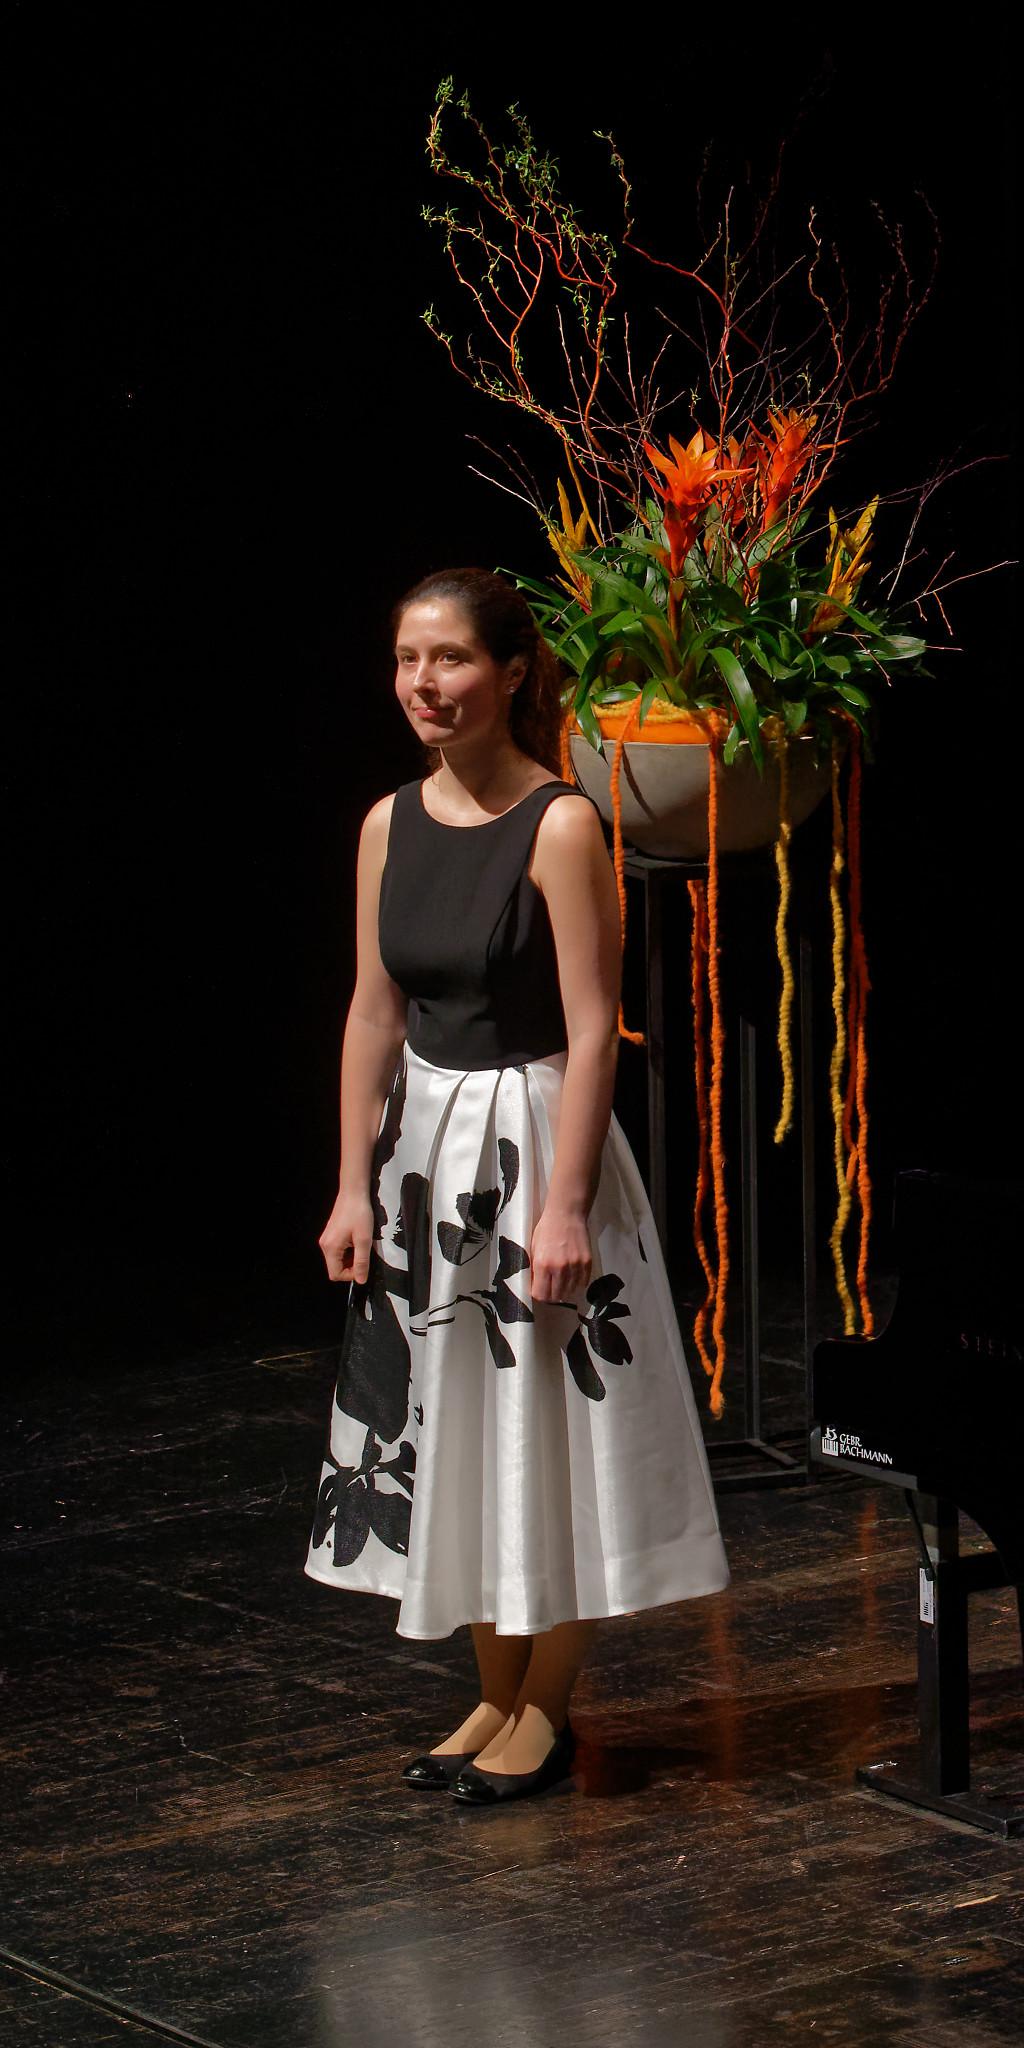 Alina Bercu @ Klavierissimo Festival, Wetzikon ZH, 2020-02-01 20h00 (© Rolf Kyburz)